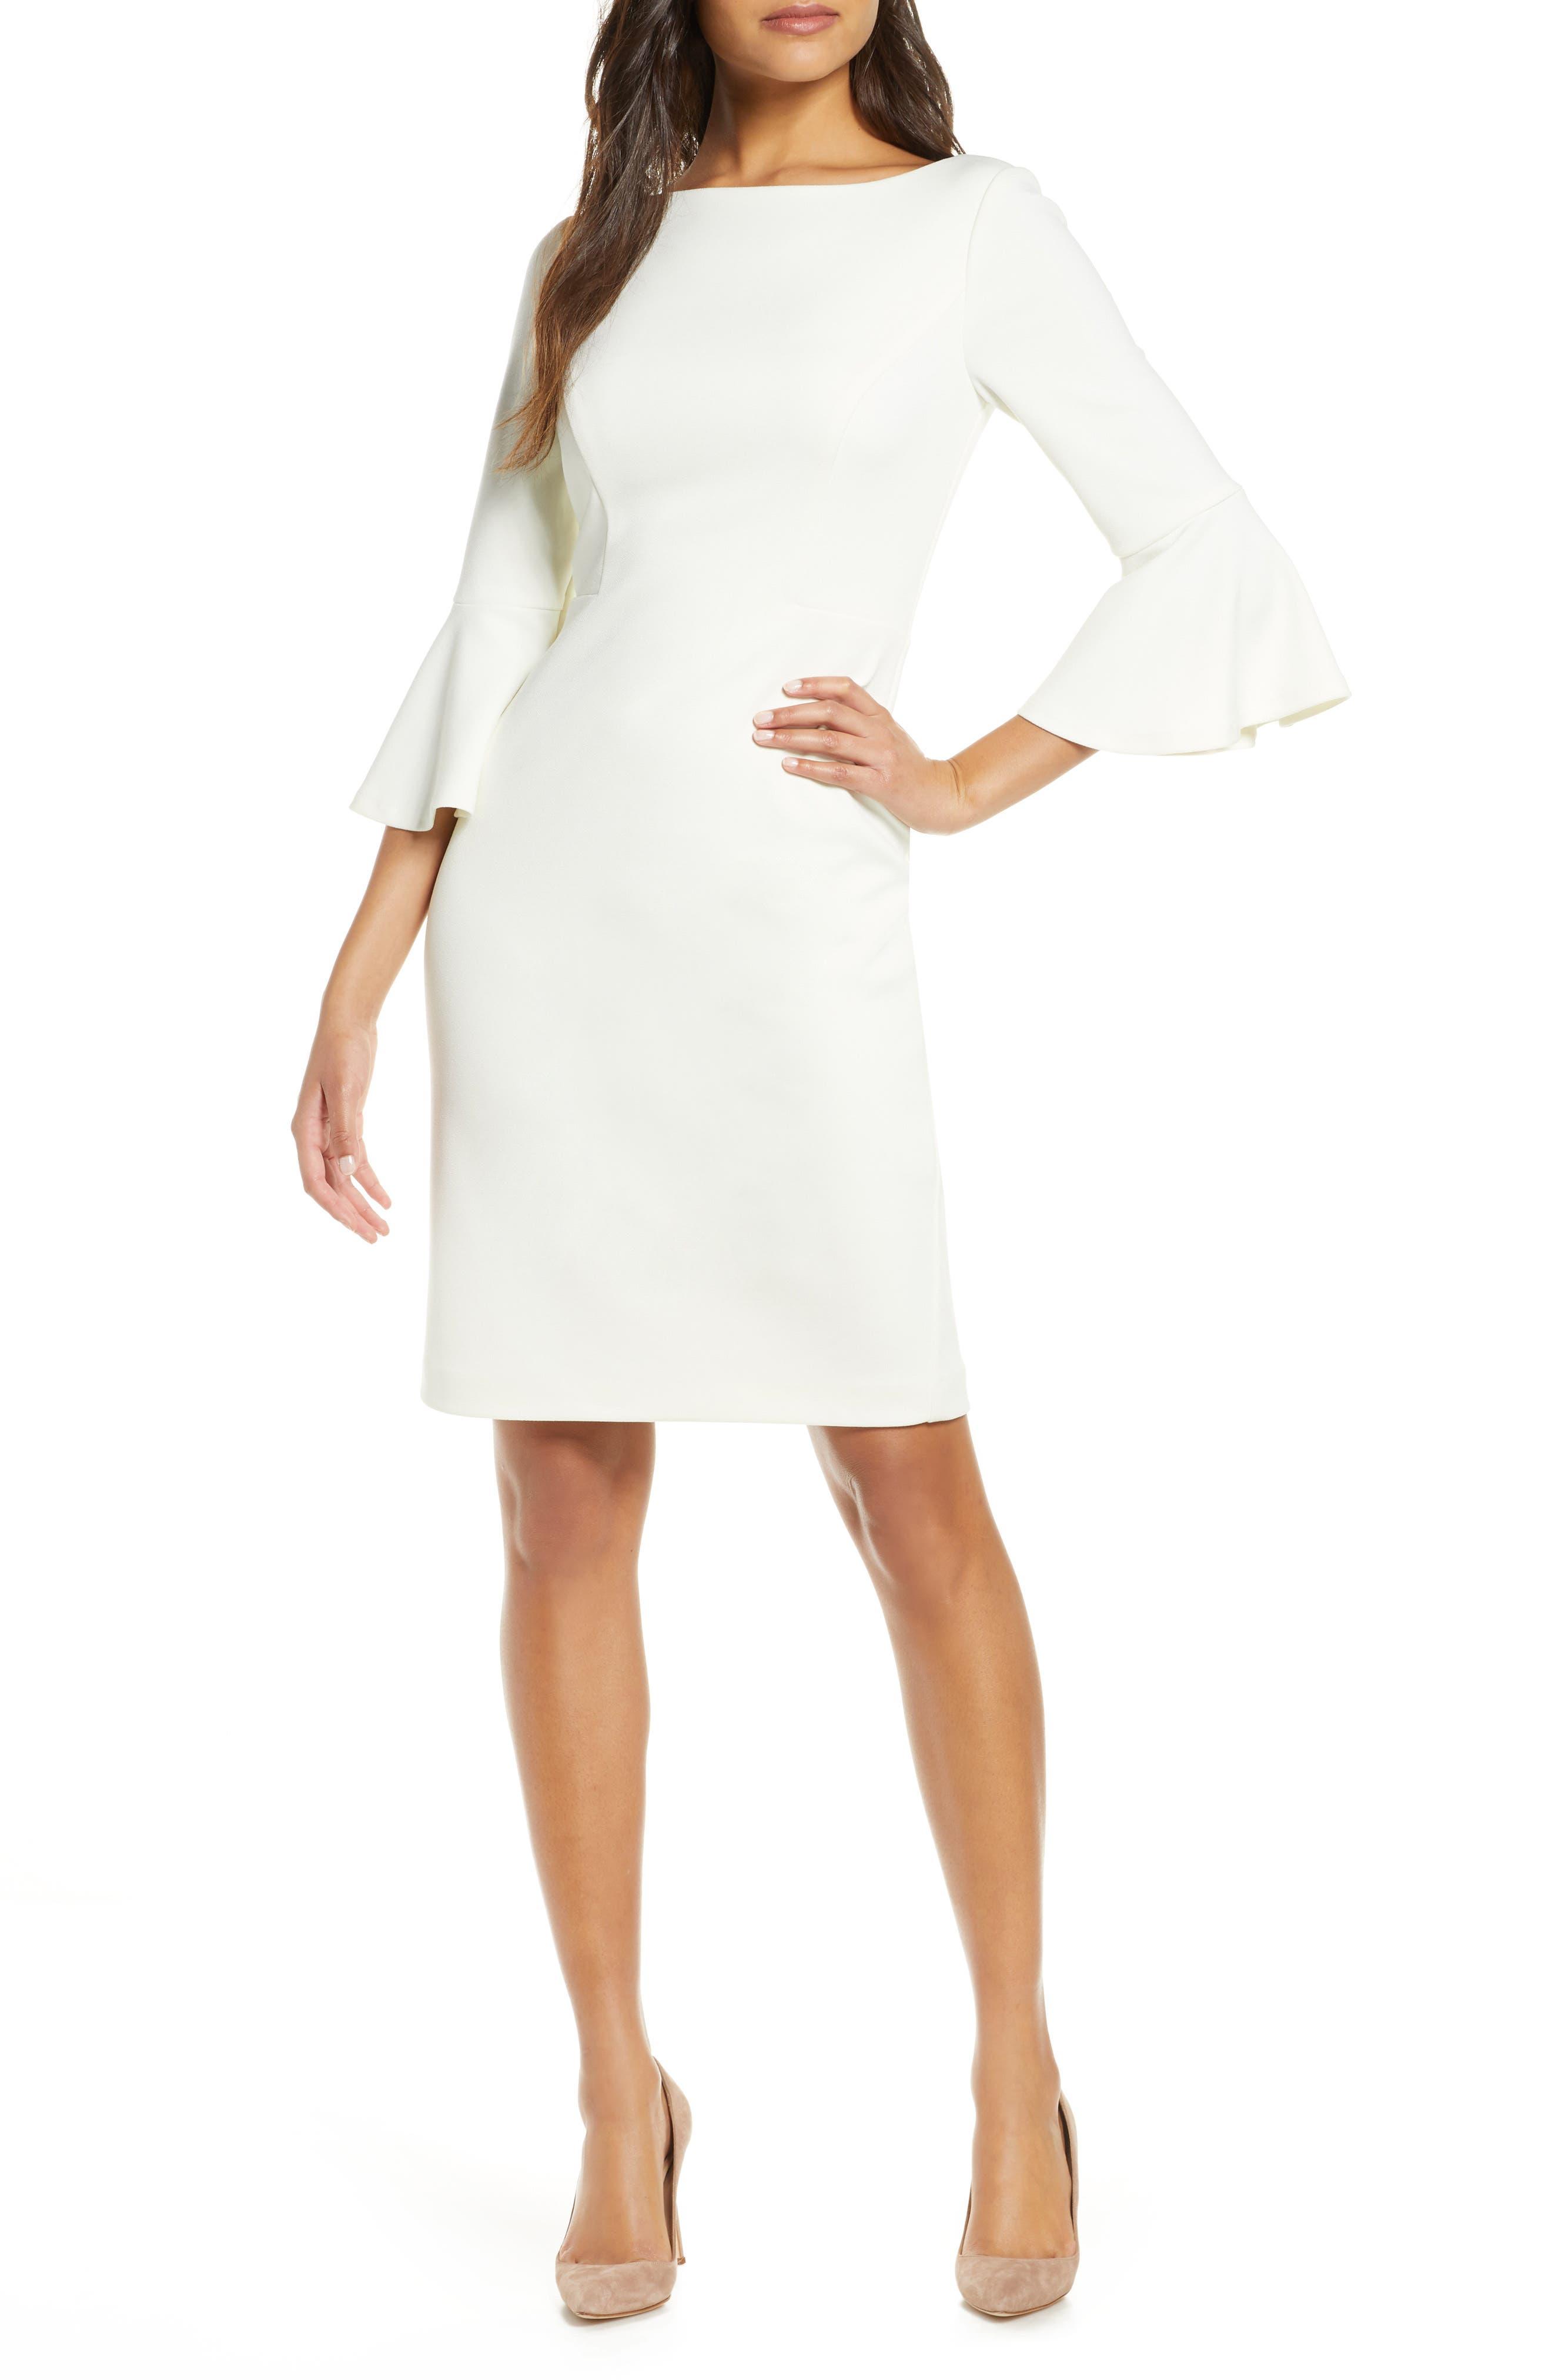 Harper Rose Bell Sleeve Bateau Neck Sheath Dress